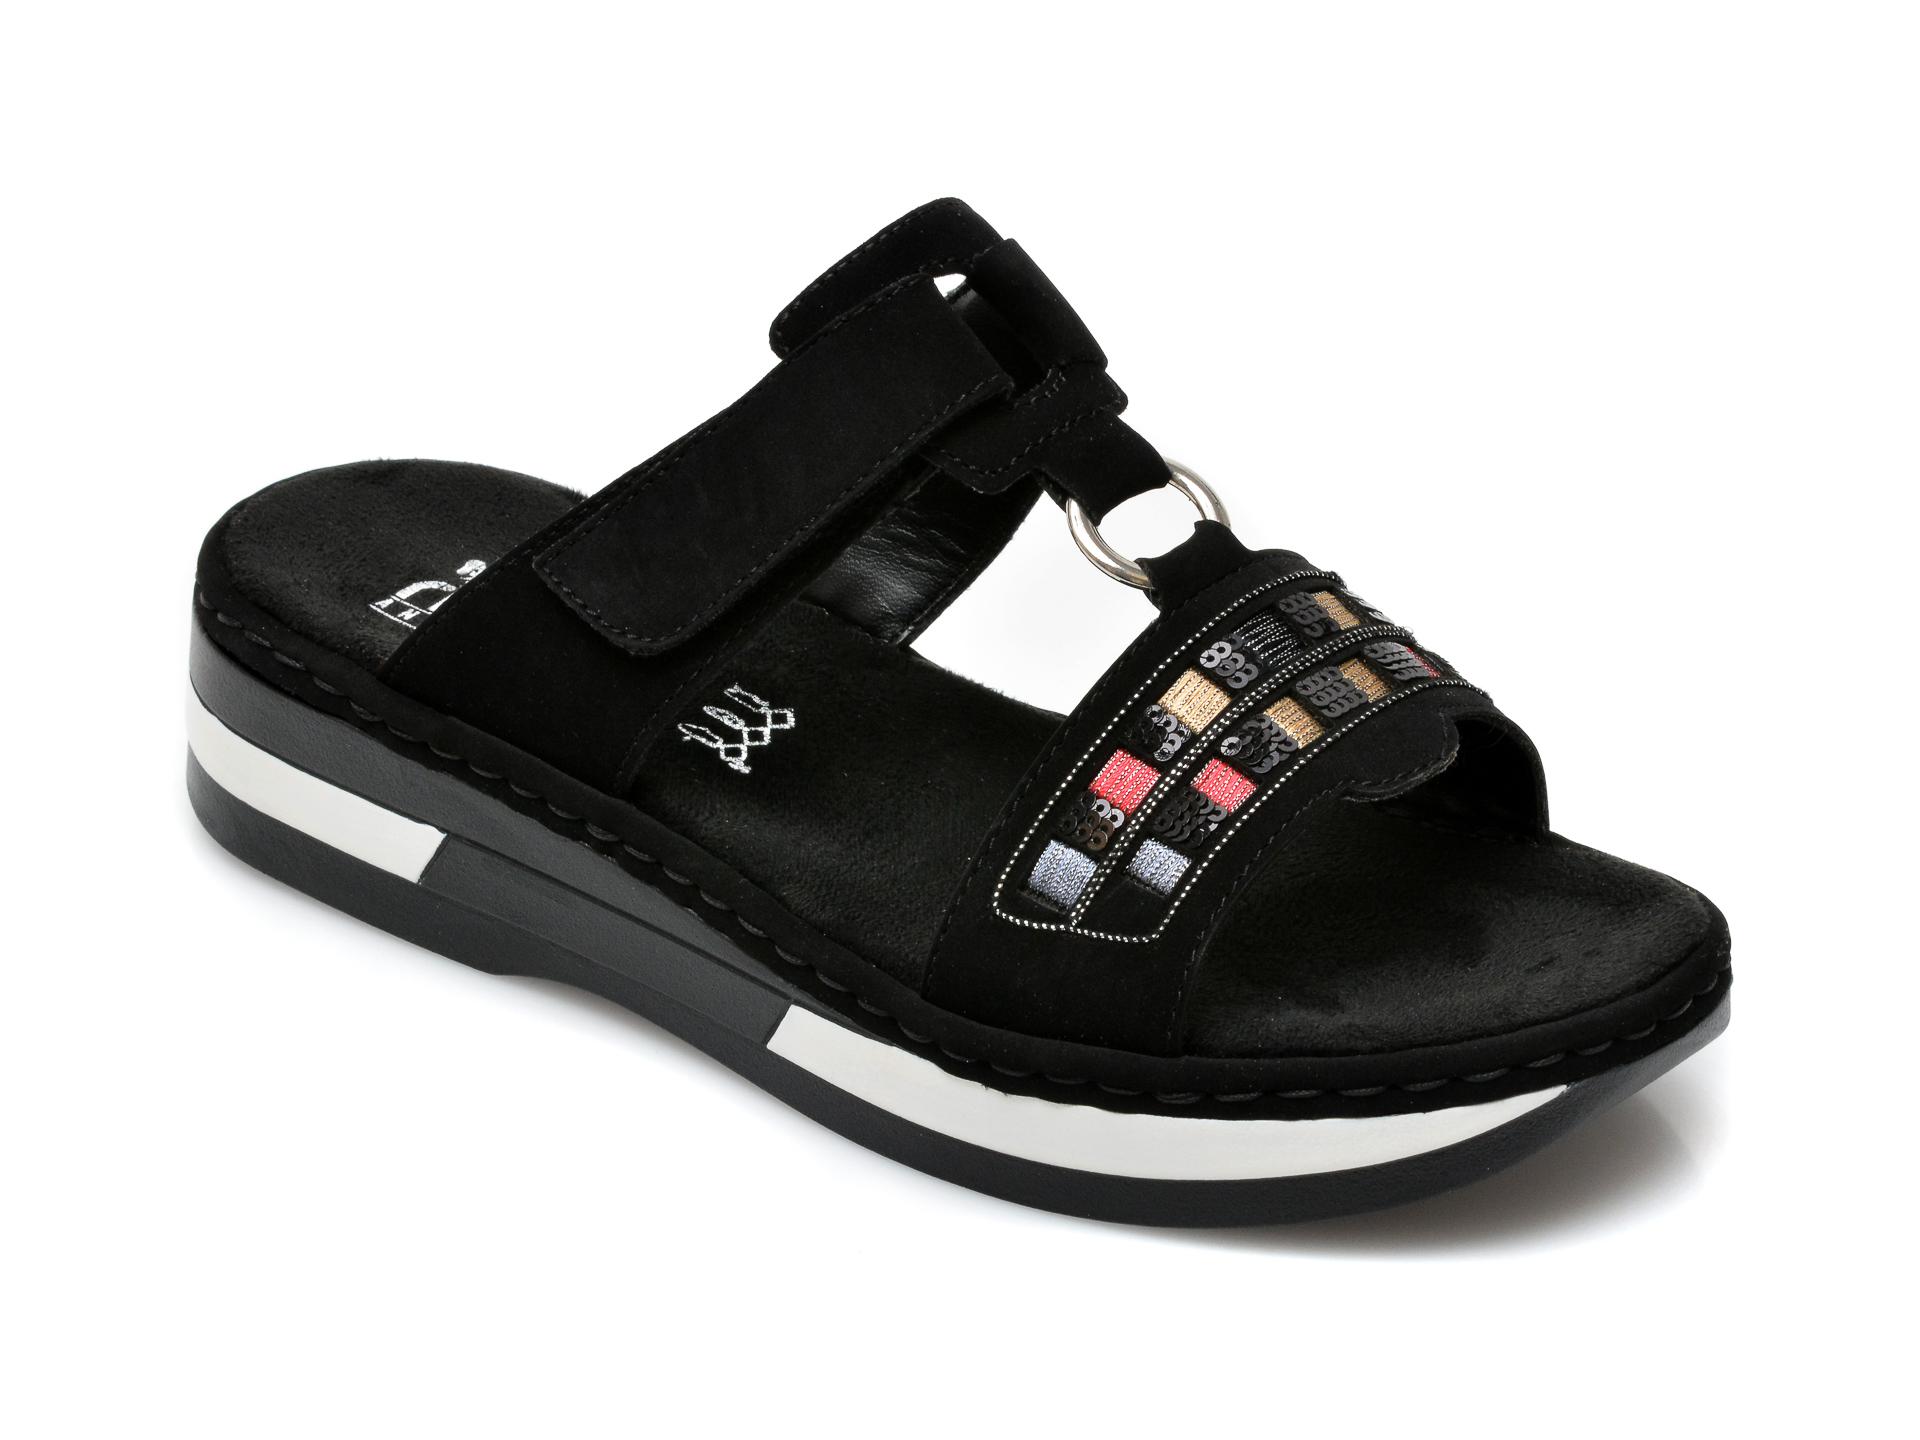 Papuci RIEKER negri, V5932, din piele ecologica